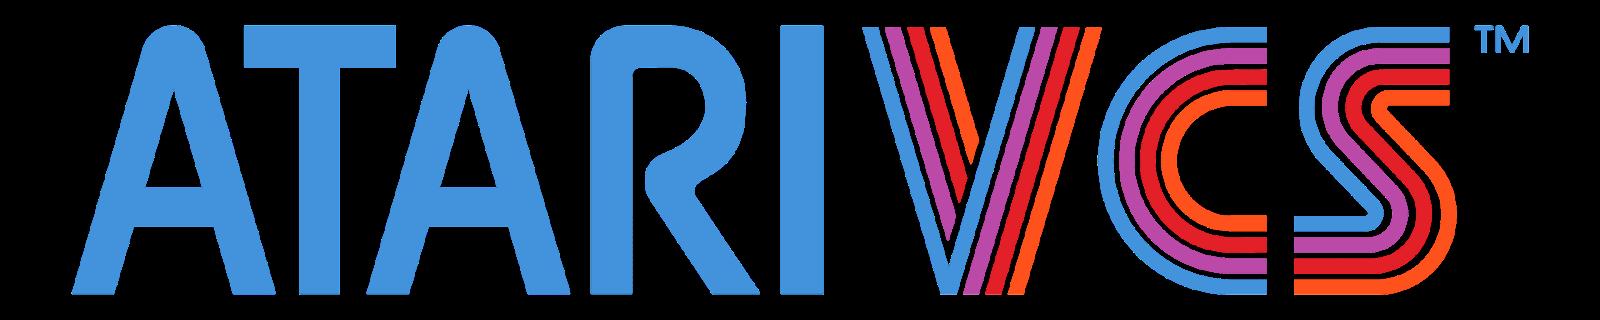 Atari VCS Review 4